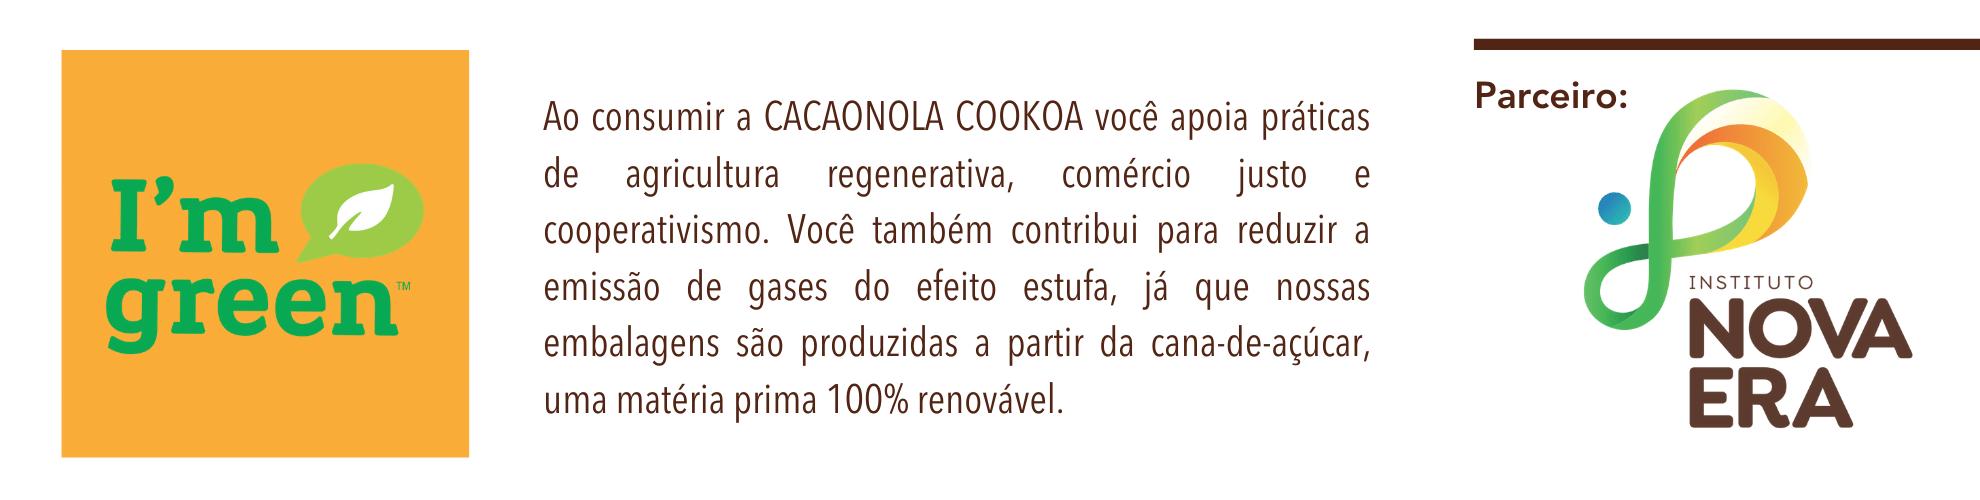 im green cacaonola